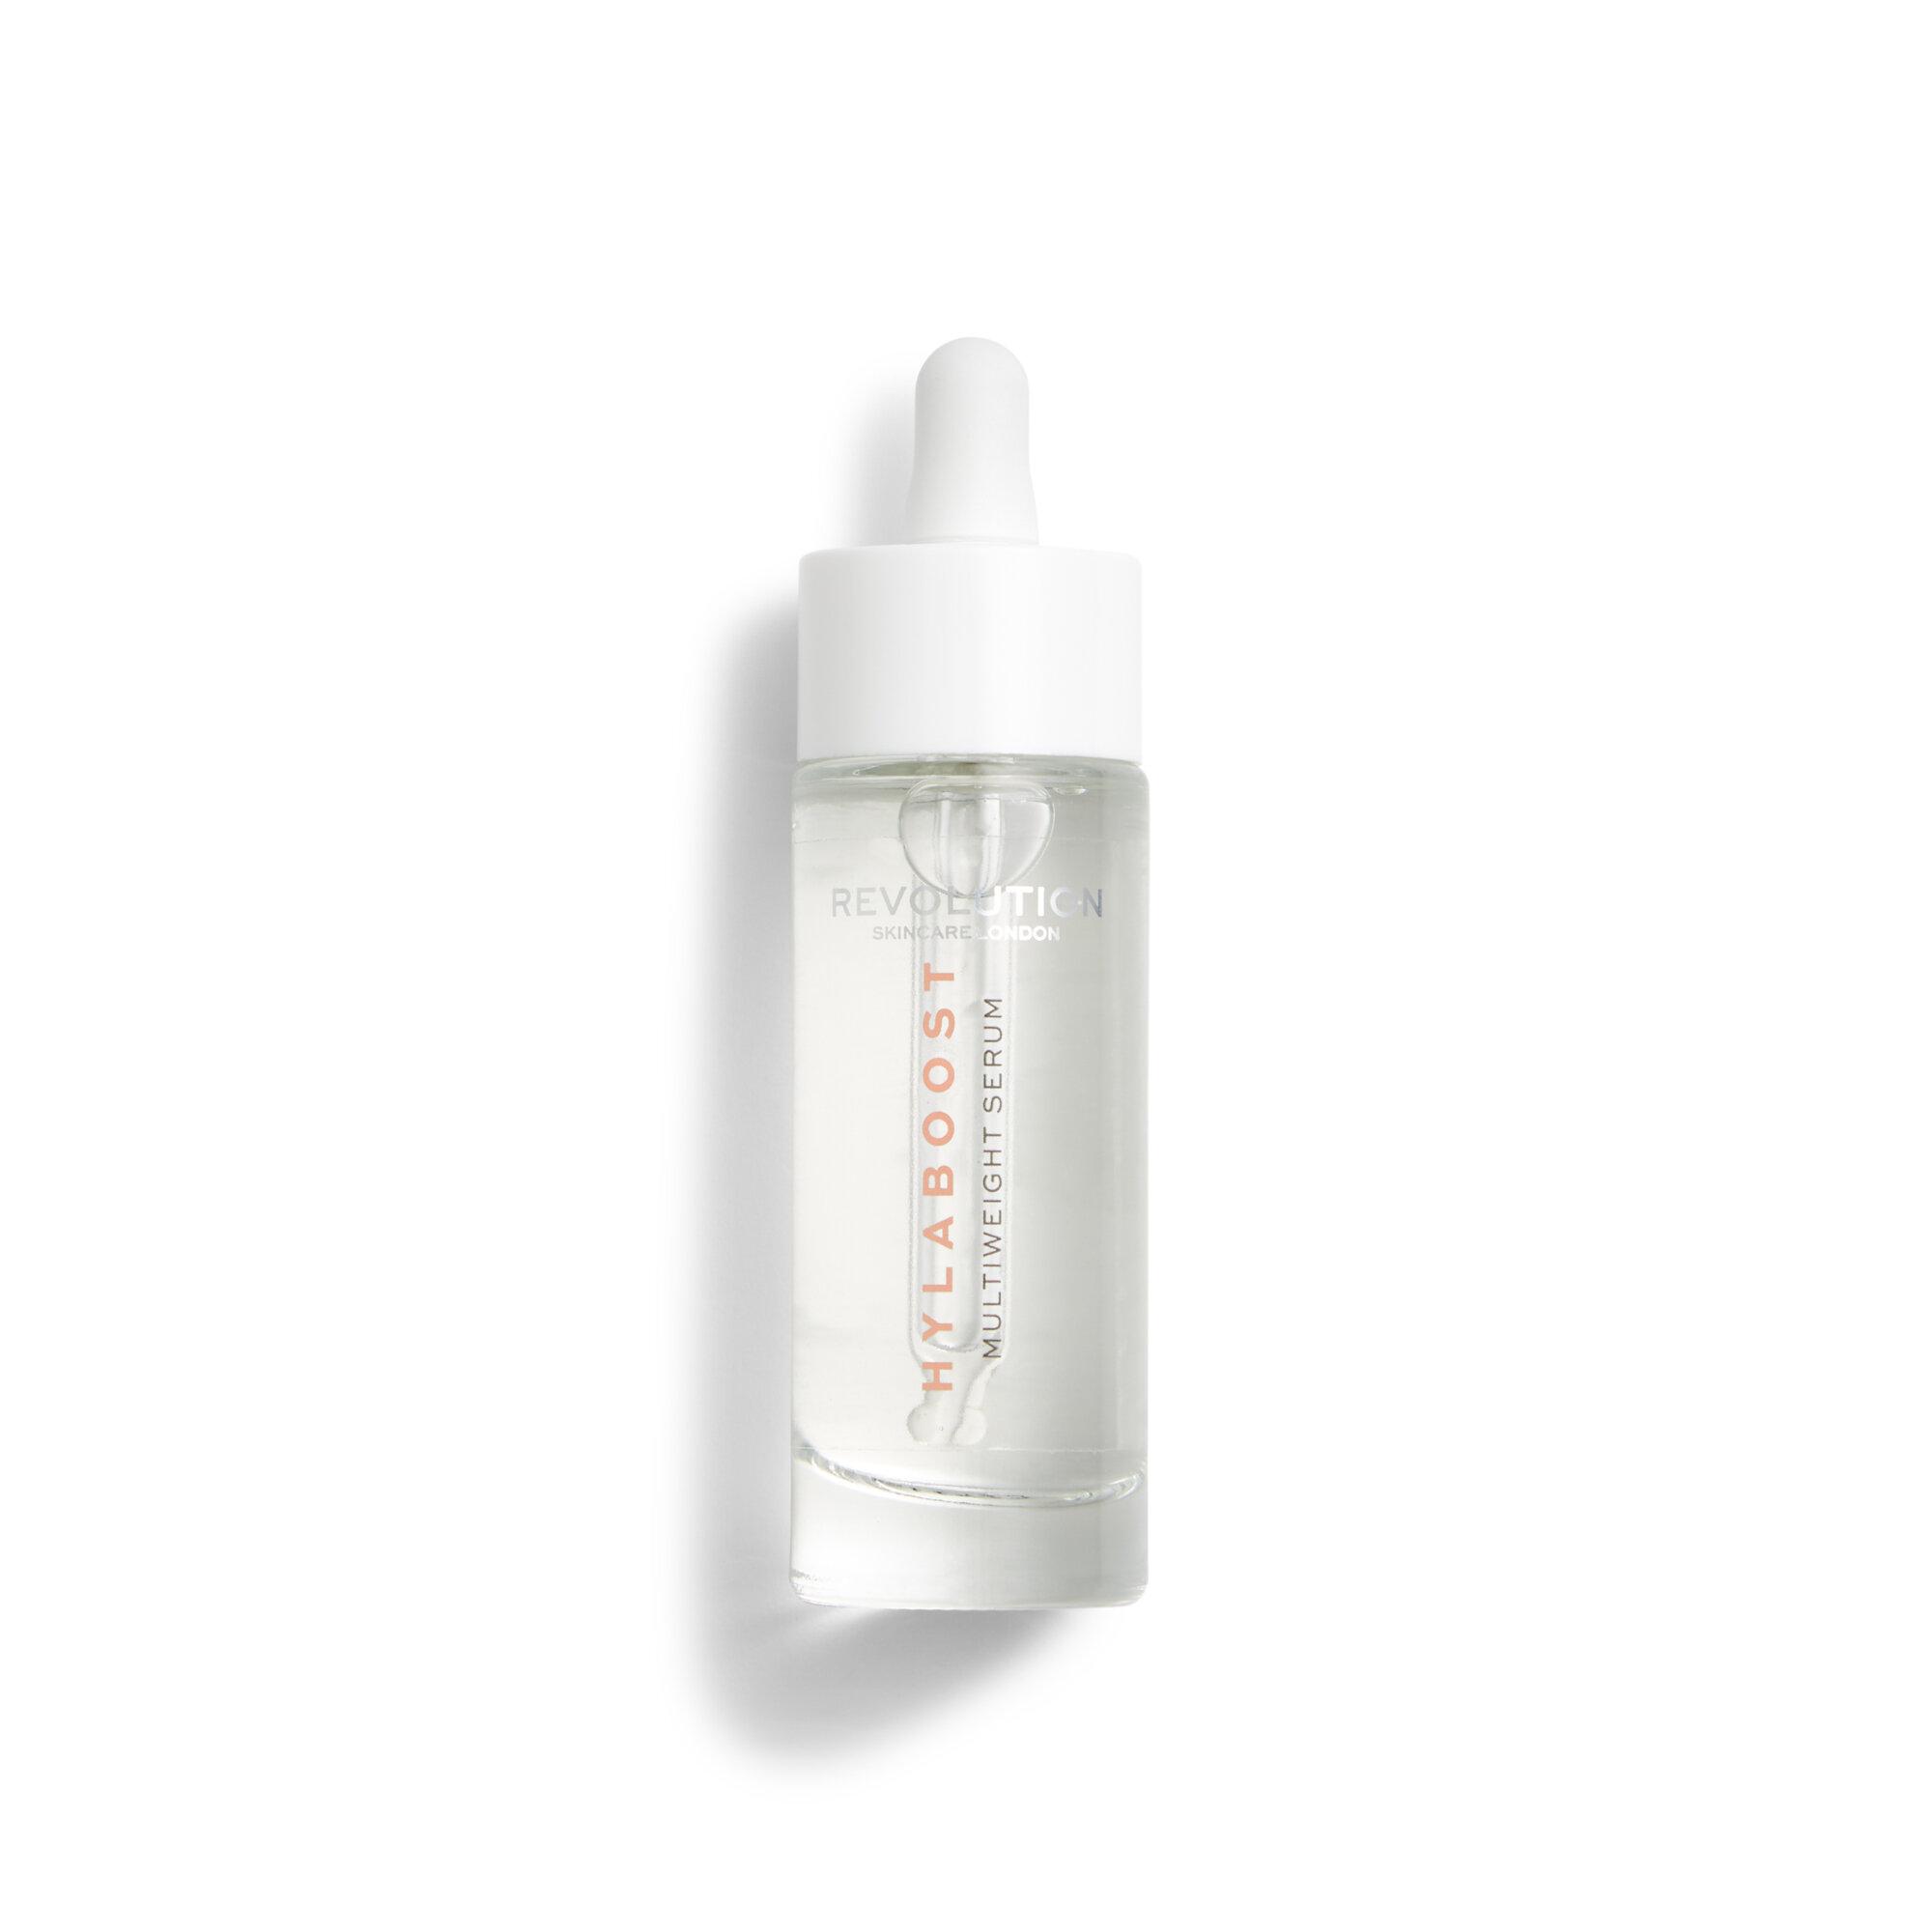 Revolution Skincare Hylaboost Multiweight Hyaluronic Serum